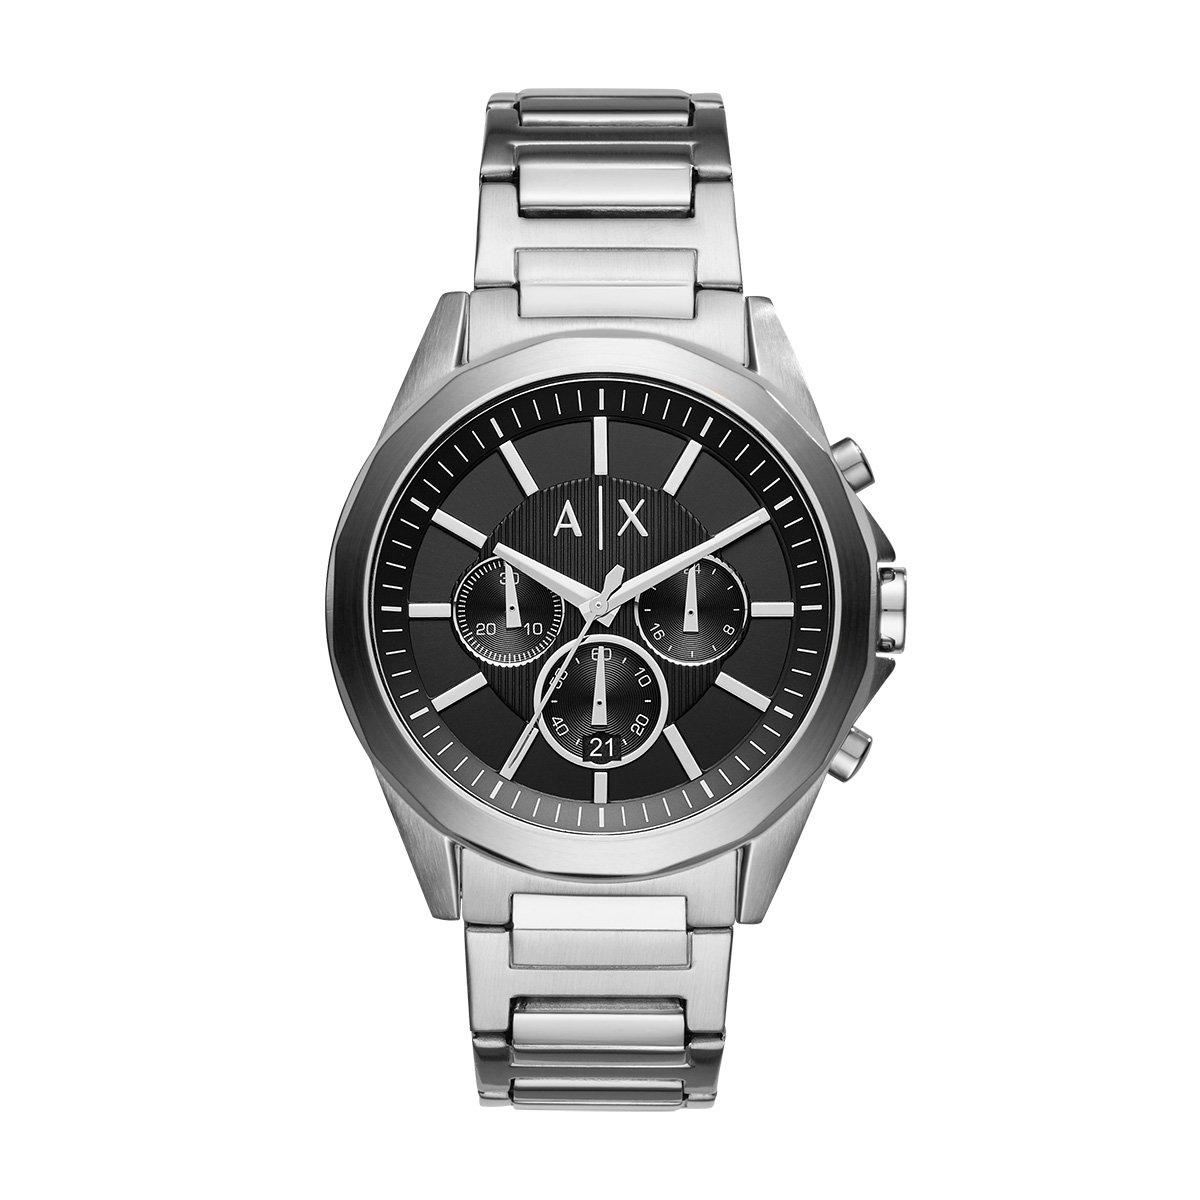 ad911ed81093 Reloj Caballero Armani Exchange AX2600